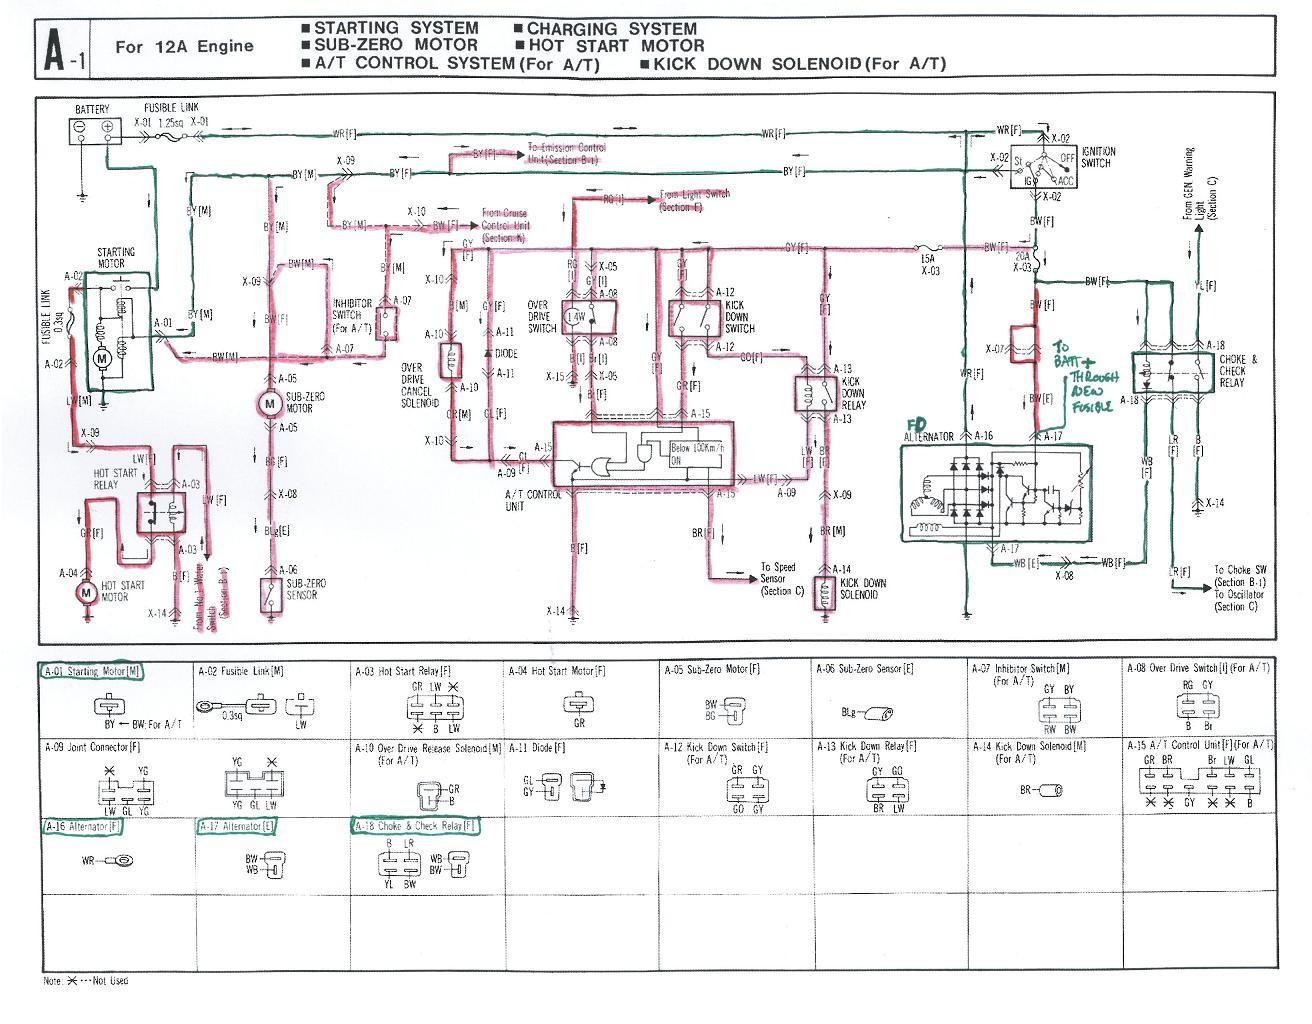 Air Line Diagram 2000 Freightliner Truck Freightliner Wiring Schematic Of Air Line Diagram 2000 Freightliner Truck